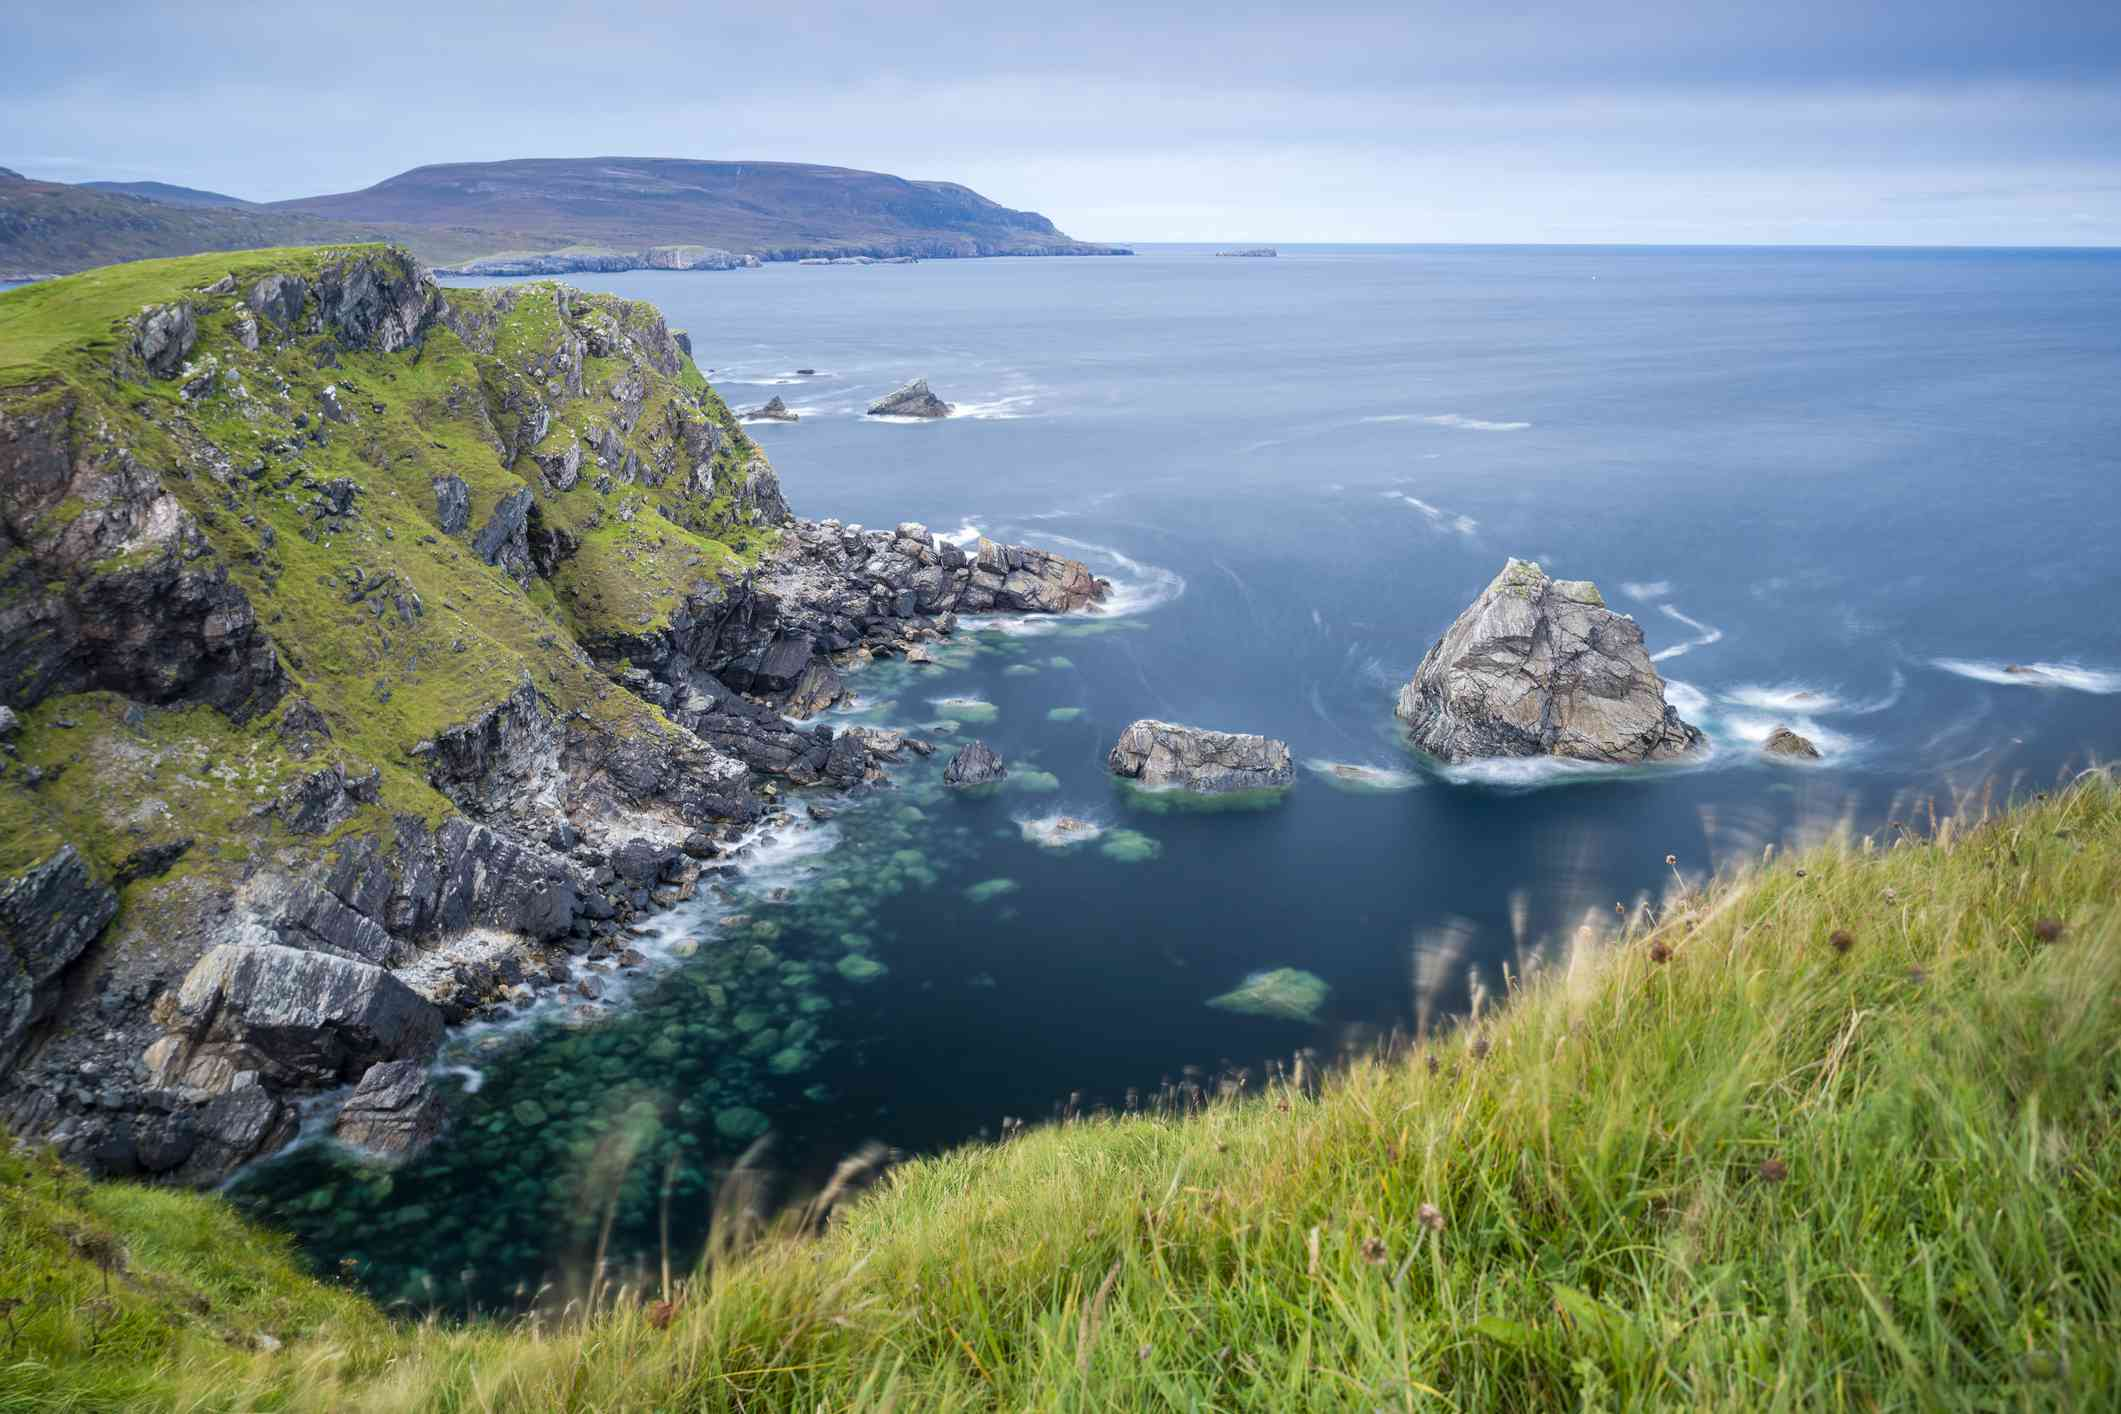 UK, Scotland, Highland, North Coast 500, Faraid Head near Durness